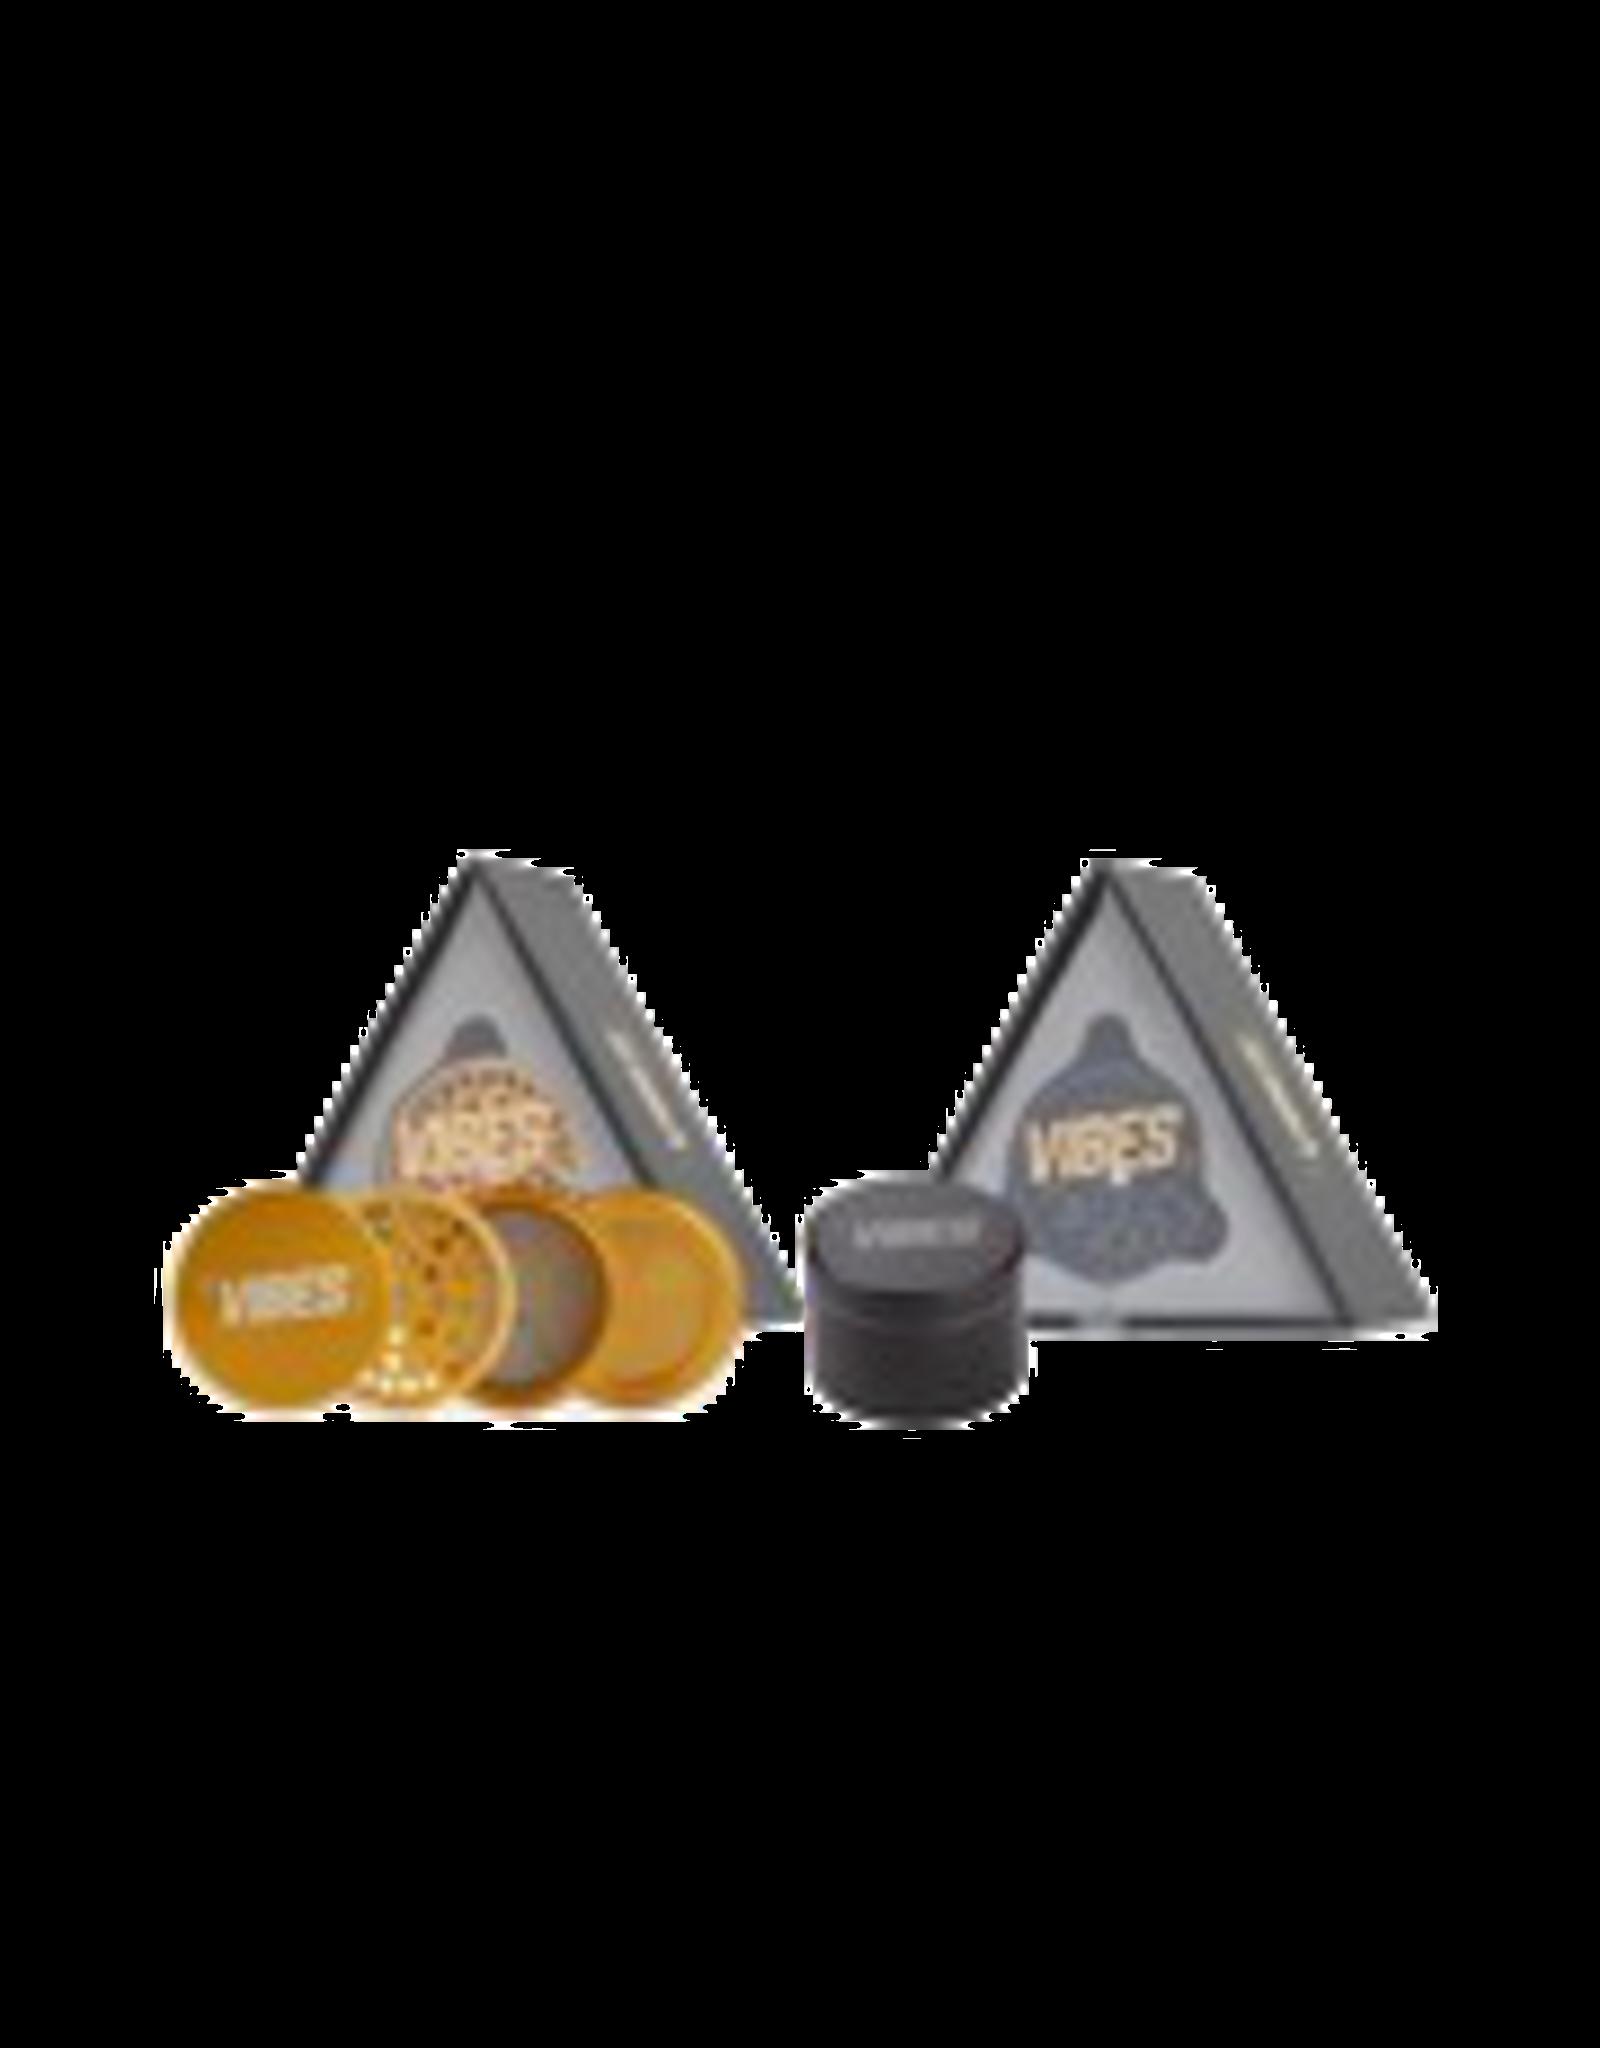 Vibes x Aerospaced Grinder (4 parts)